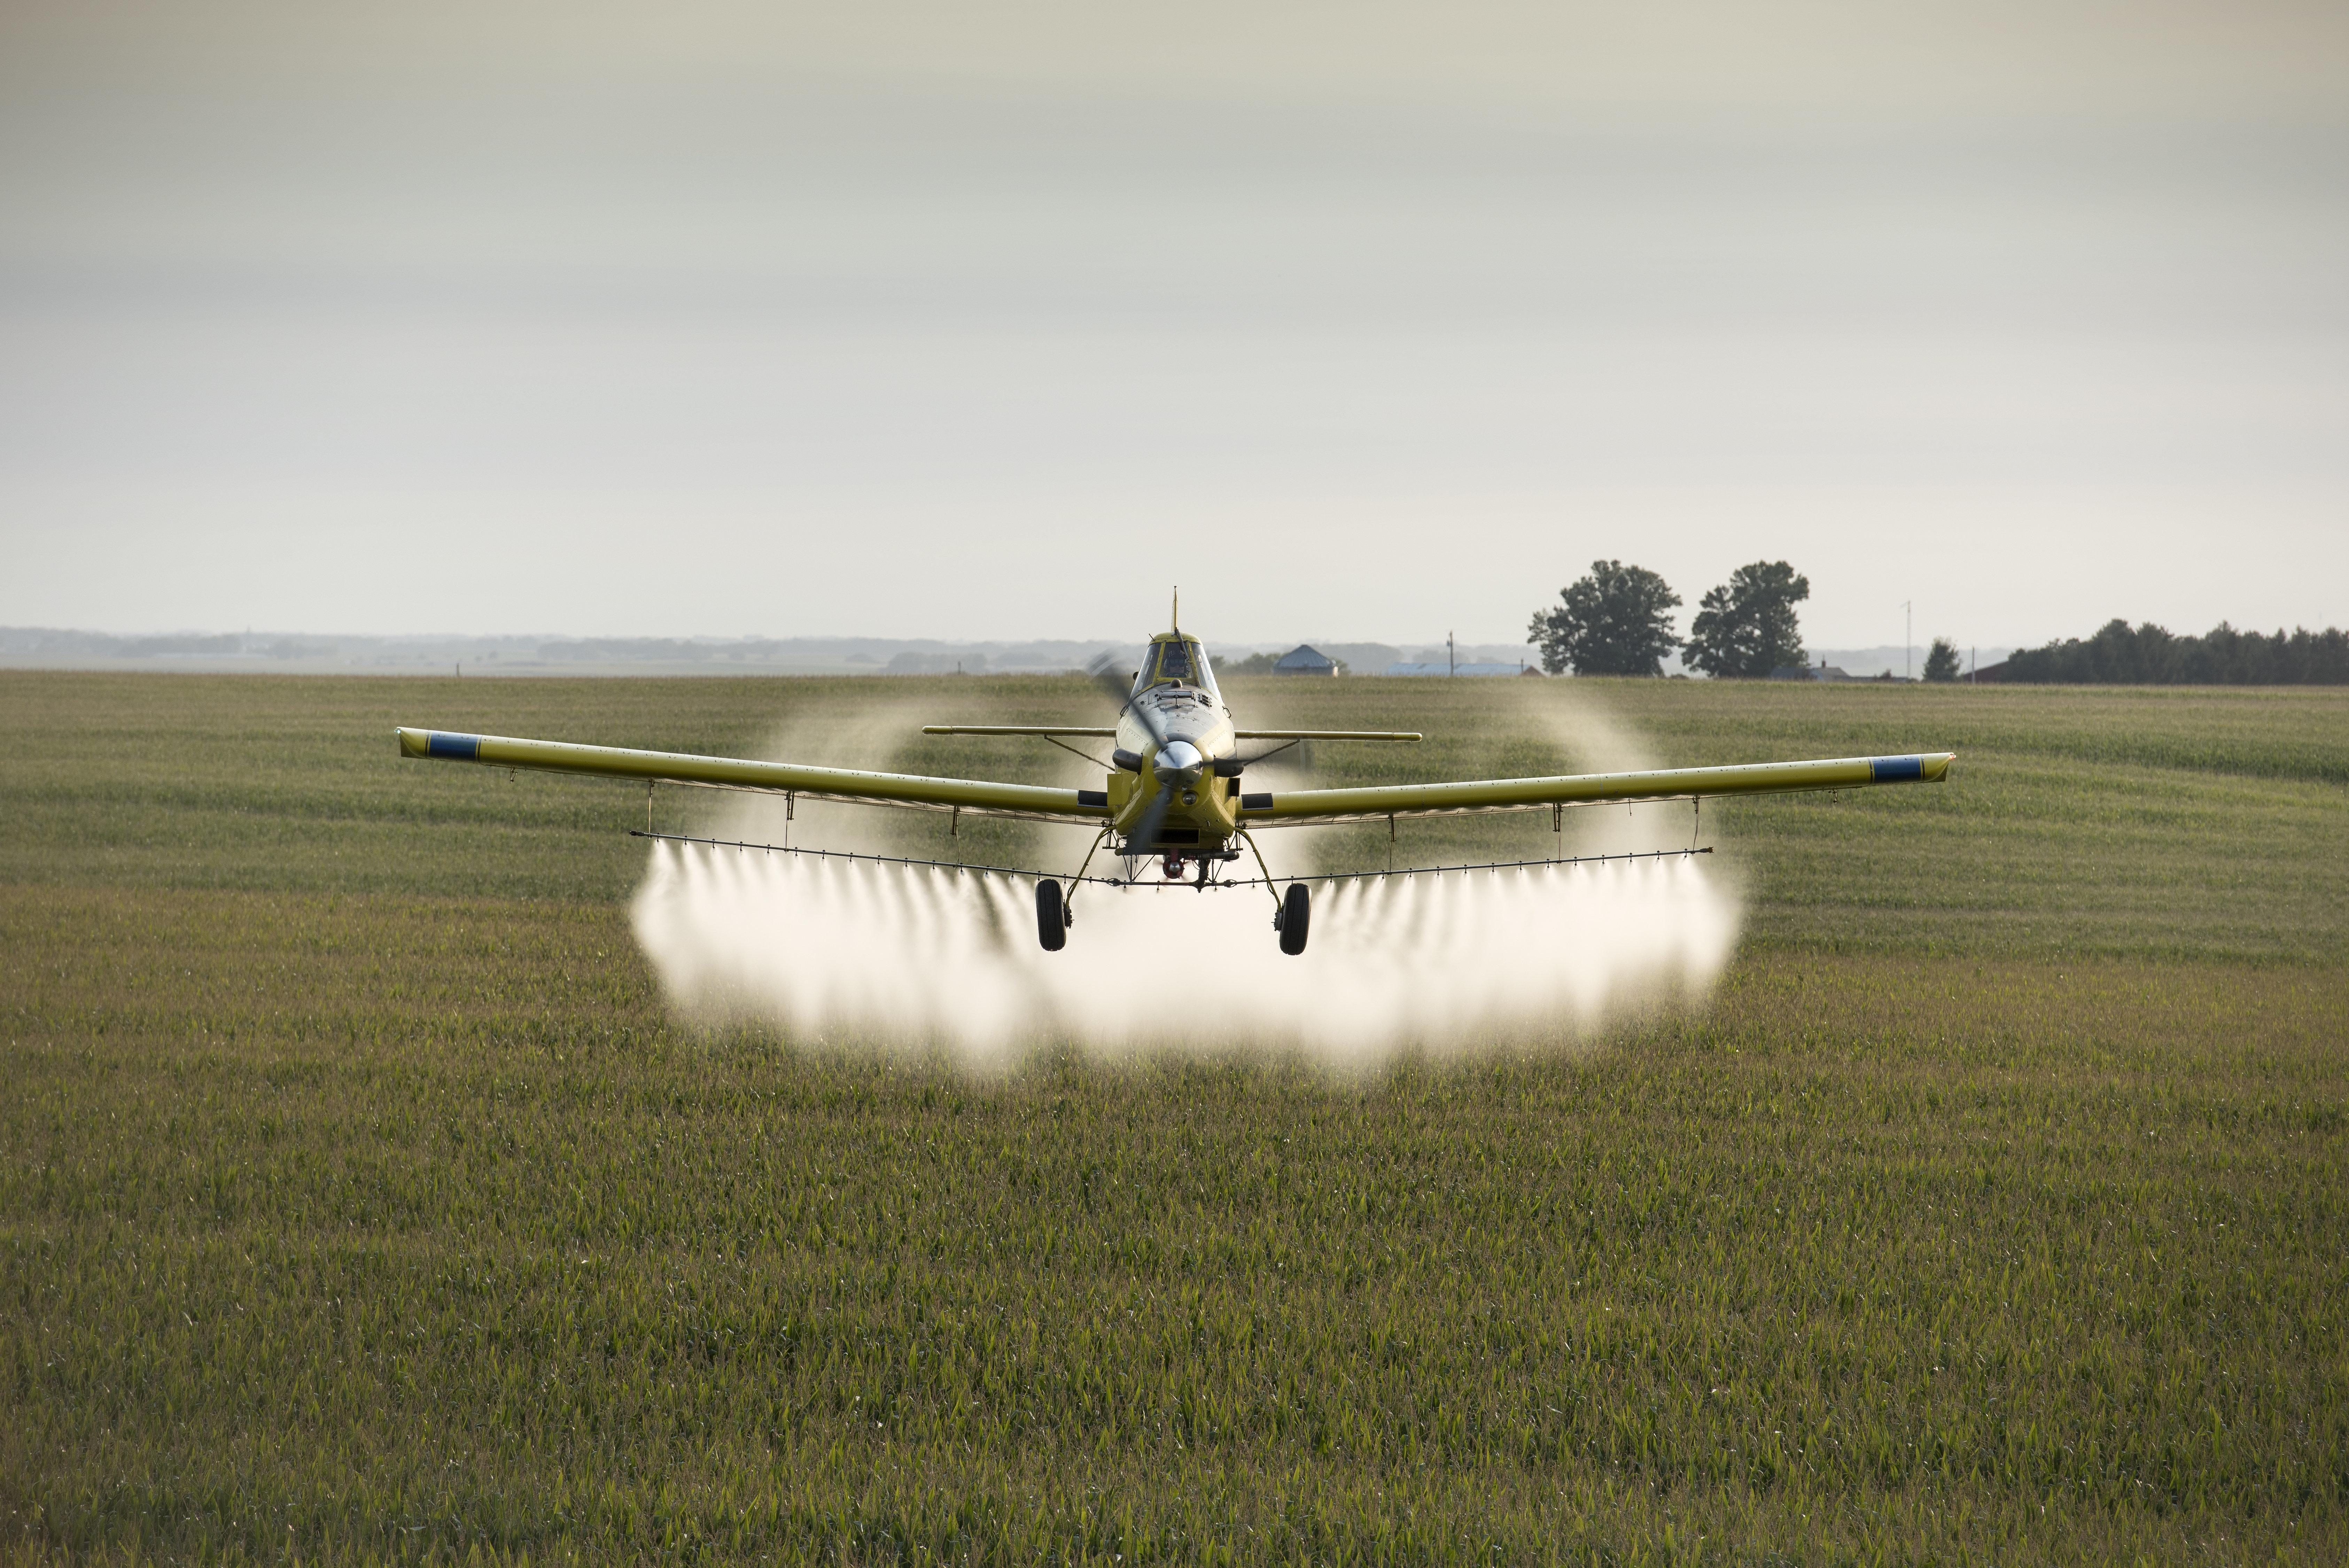 A pilot sprays crops near Whittemore, Iowa.